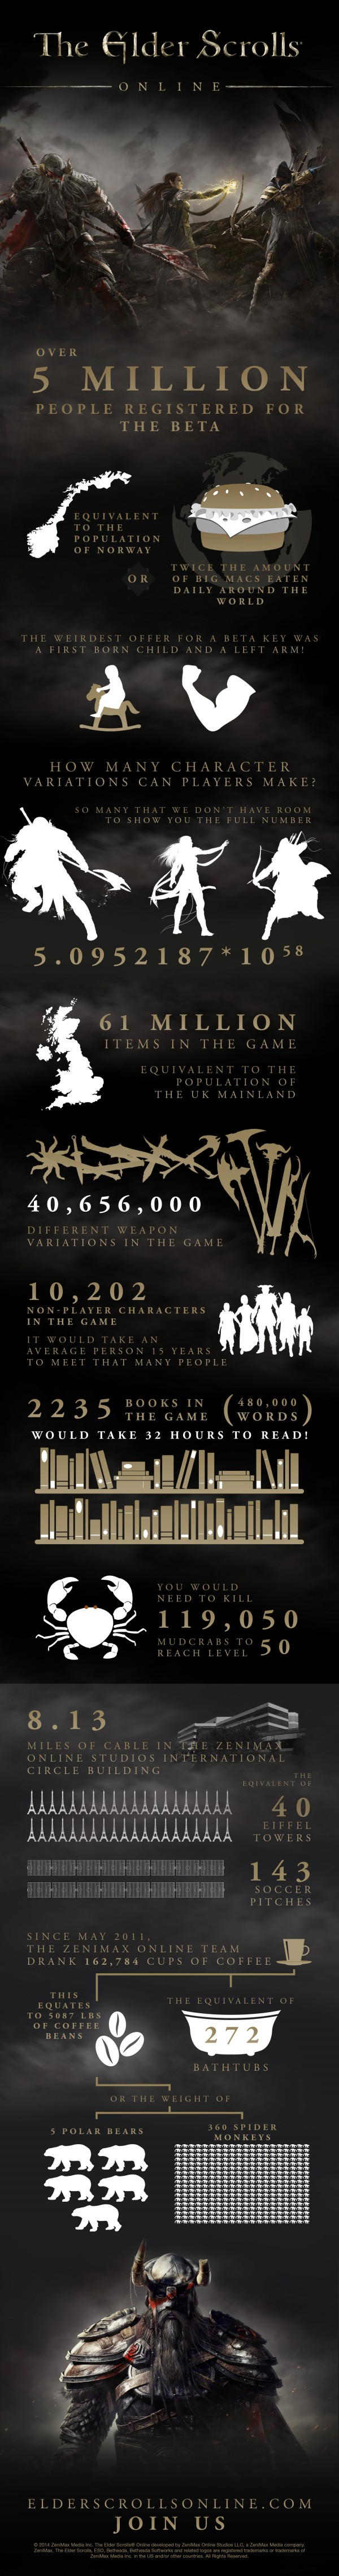 The Elder Scrolls Online - Infografía